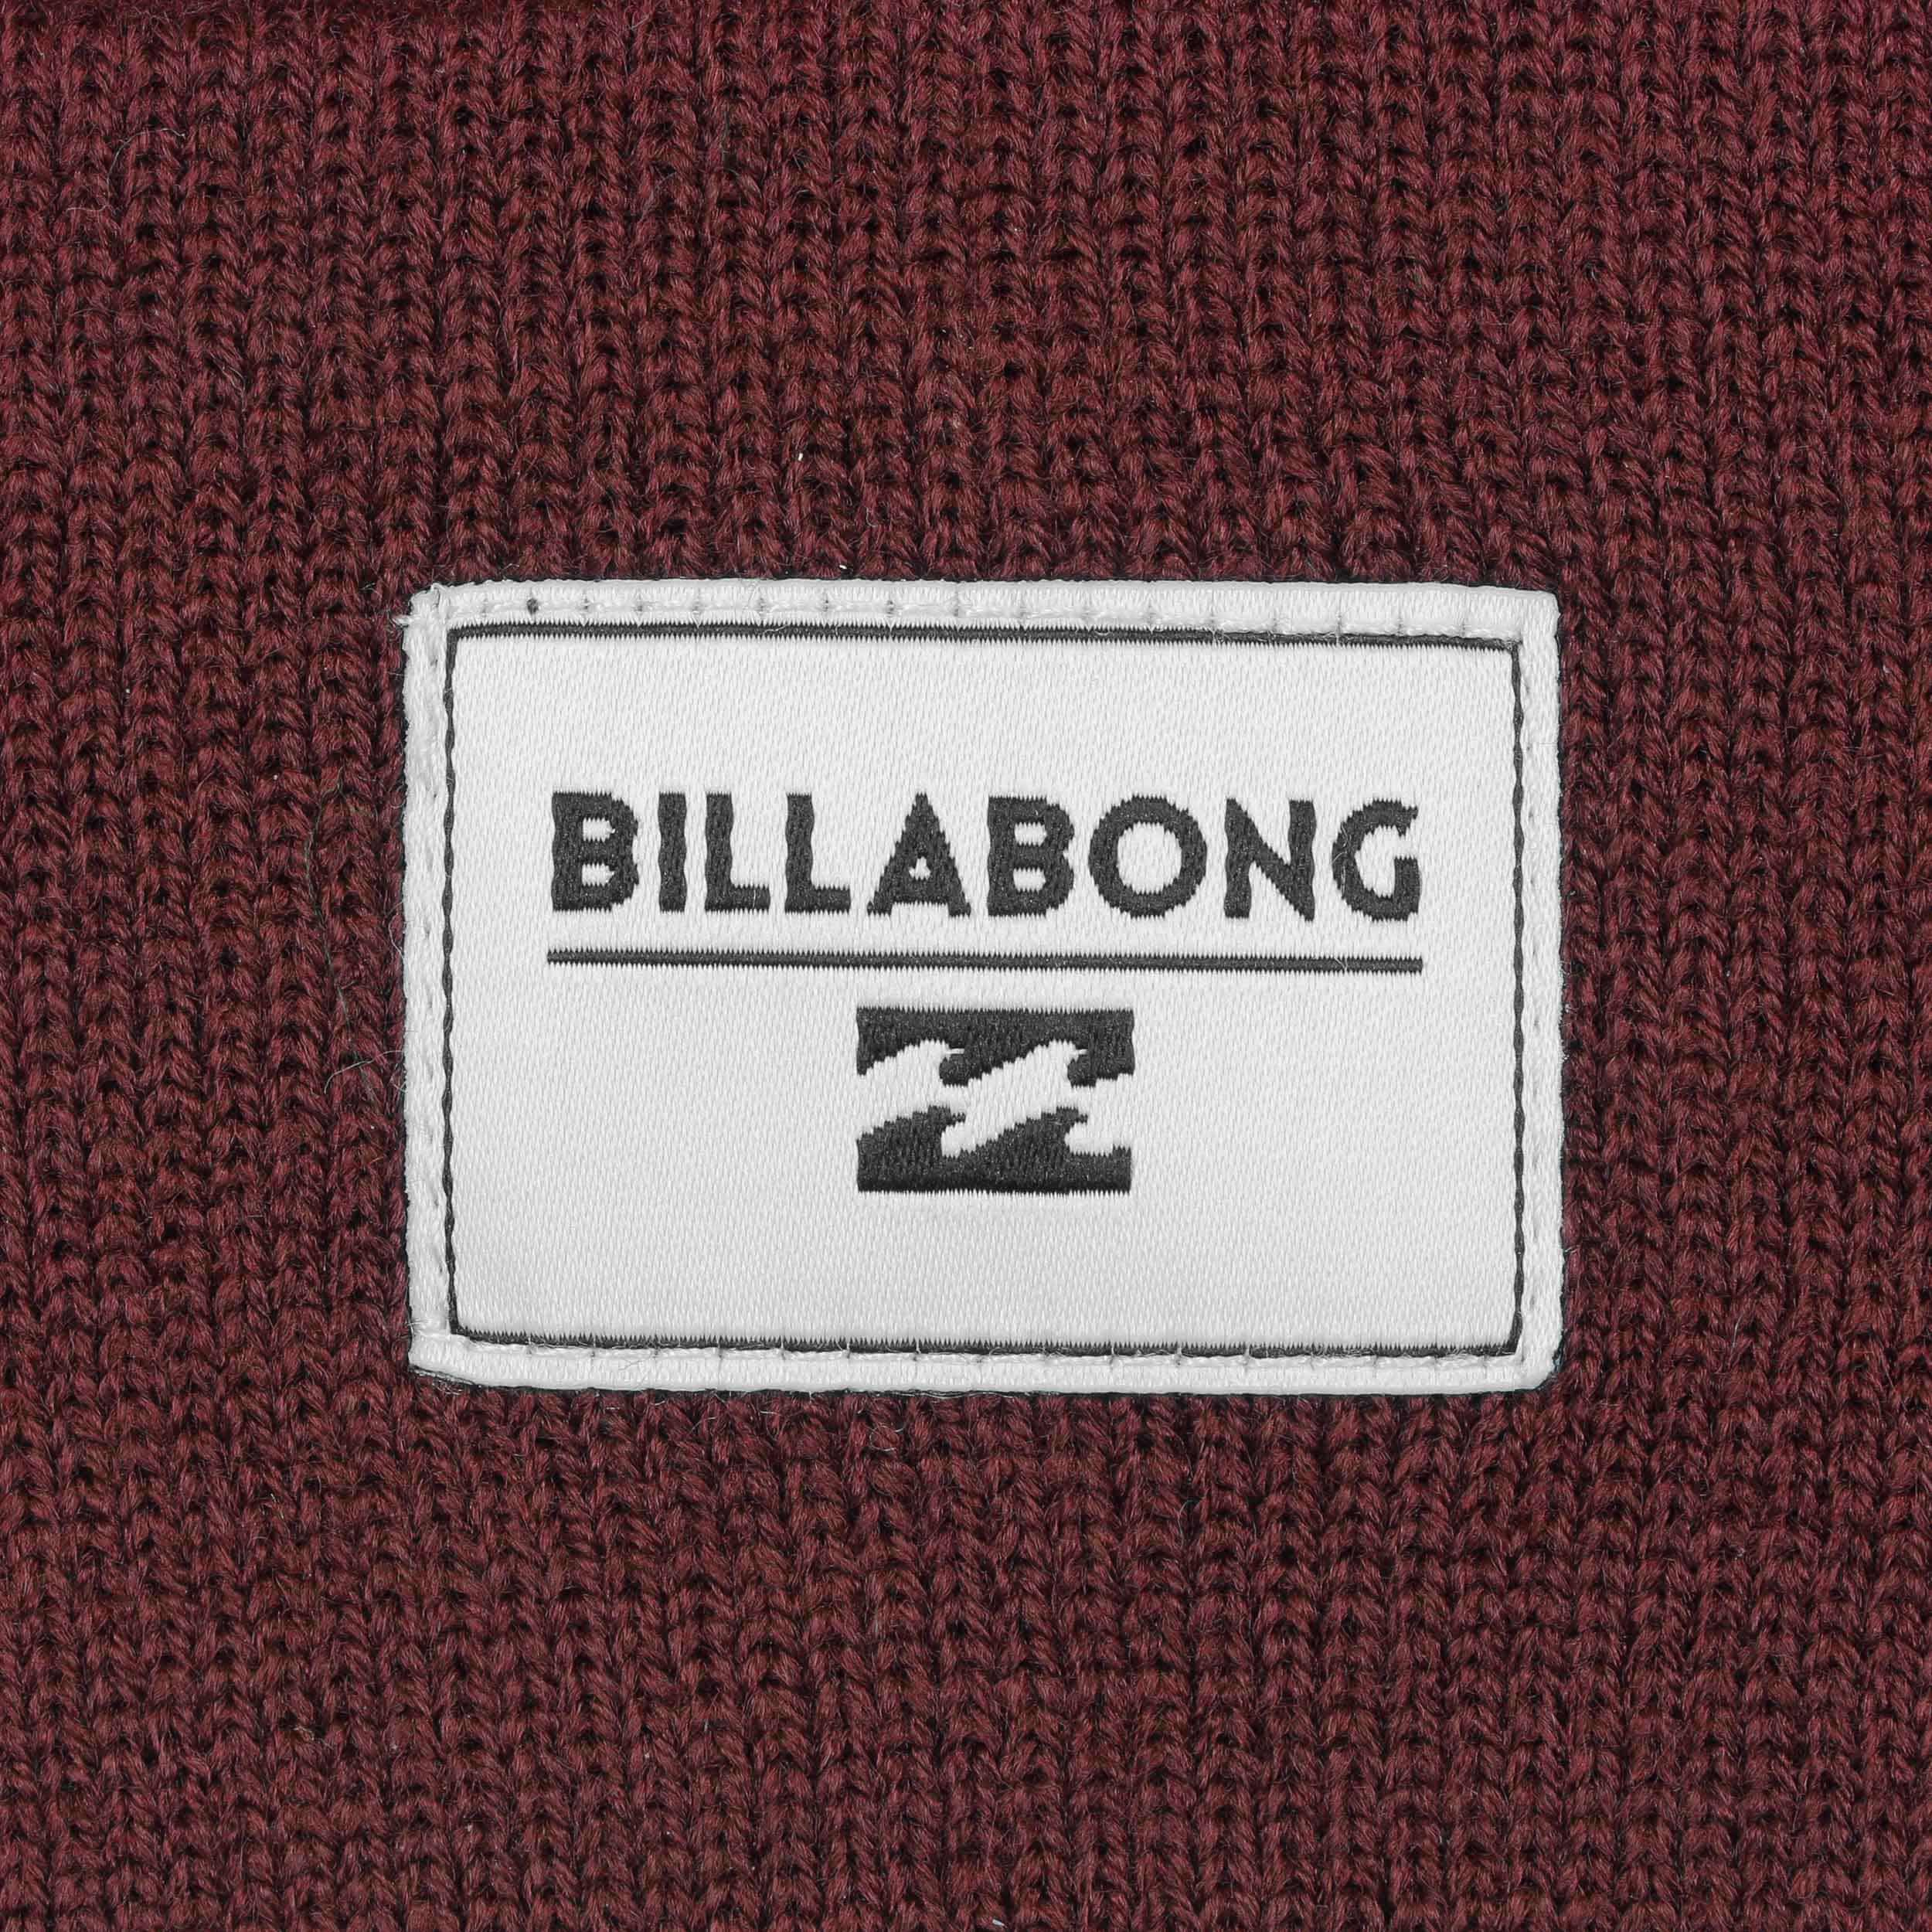 4c84d21affcd4f ... Disaster Beanie by Billabong - bordeaux 2 ...